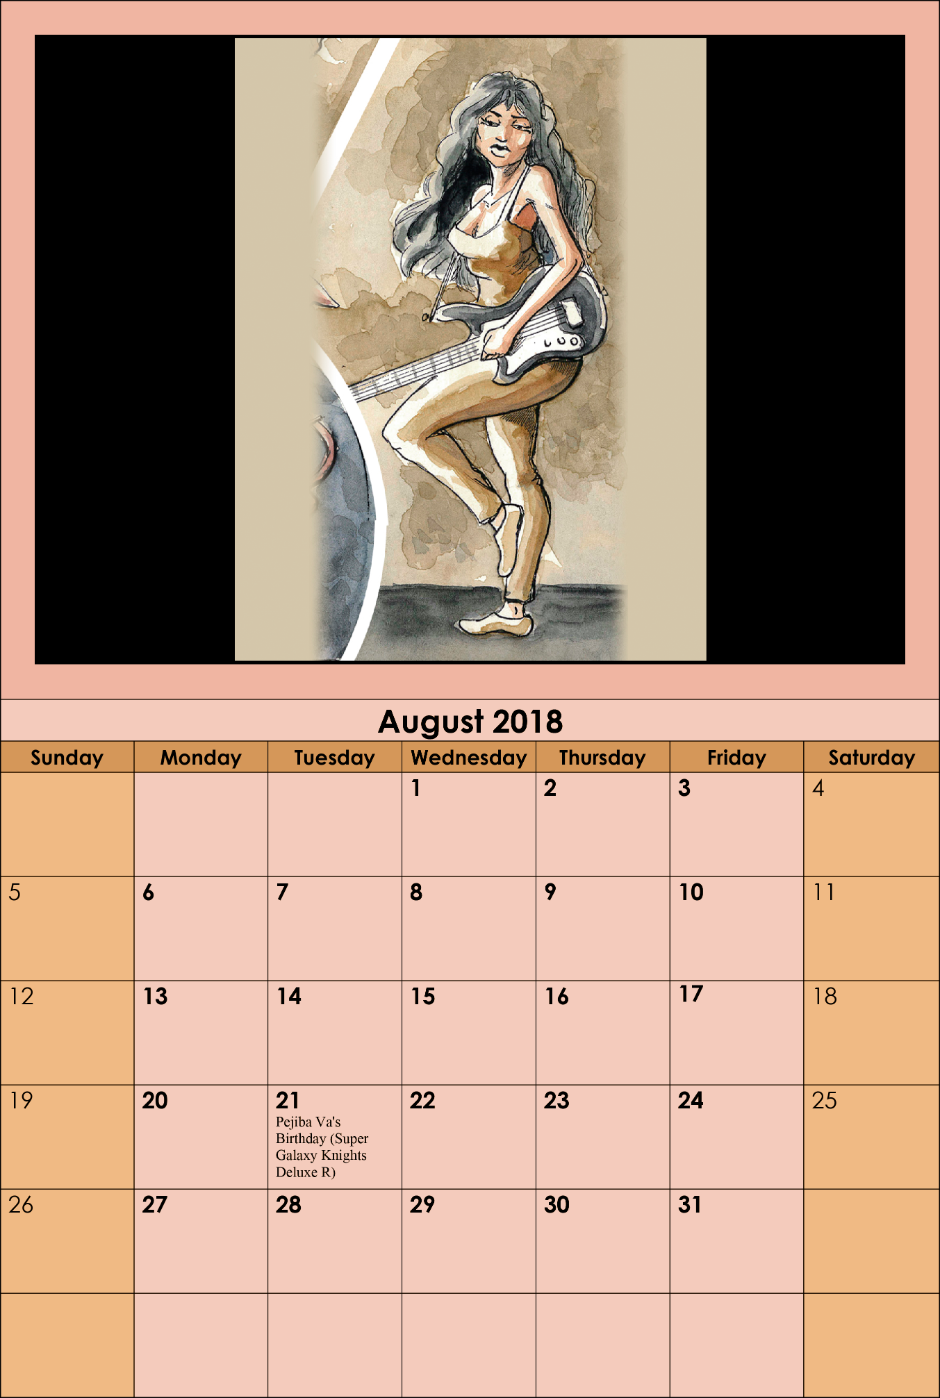 Opidane - August